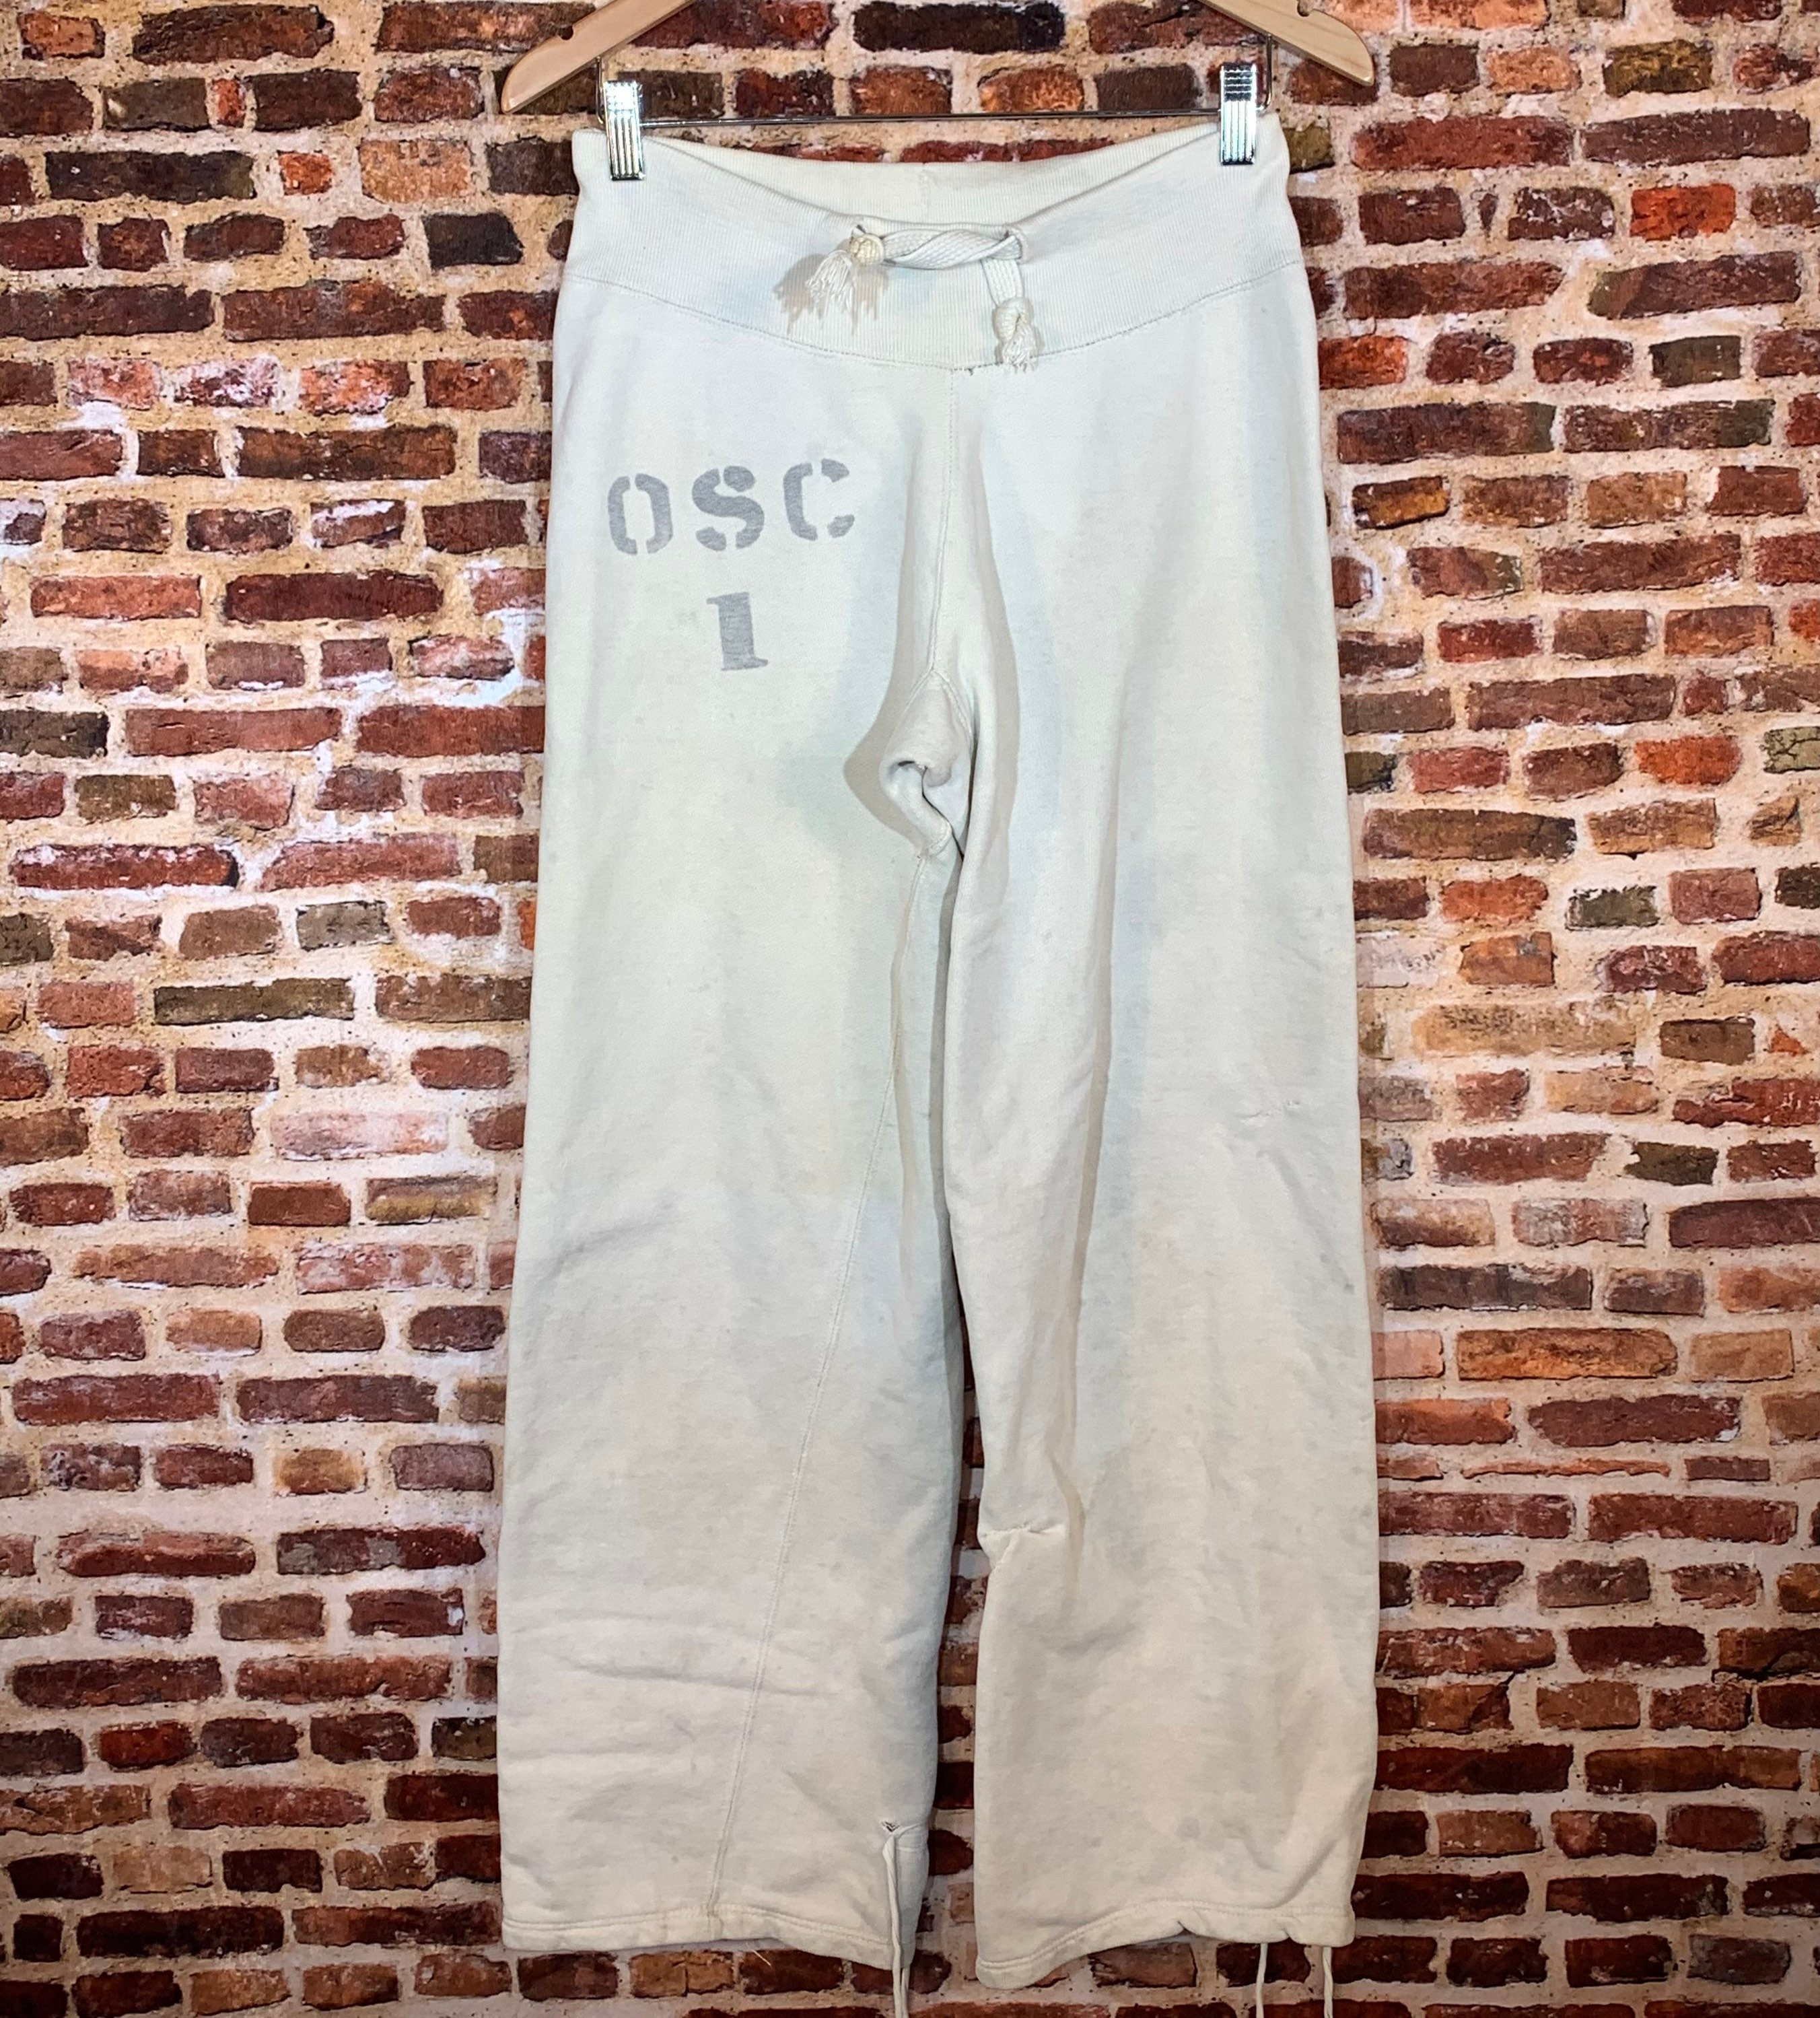 1940s Mens Ties | Wide Ties & Painted Ties Vintage 1940s Oregon State College  Now University Size Medium Sweatpants One Of A Kind $17.00 AT vintagedancer.com